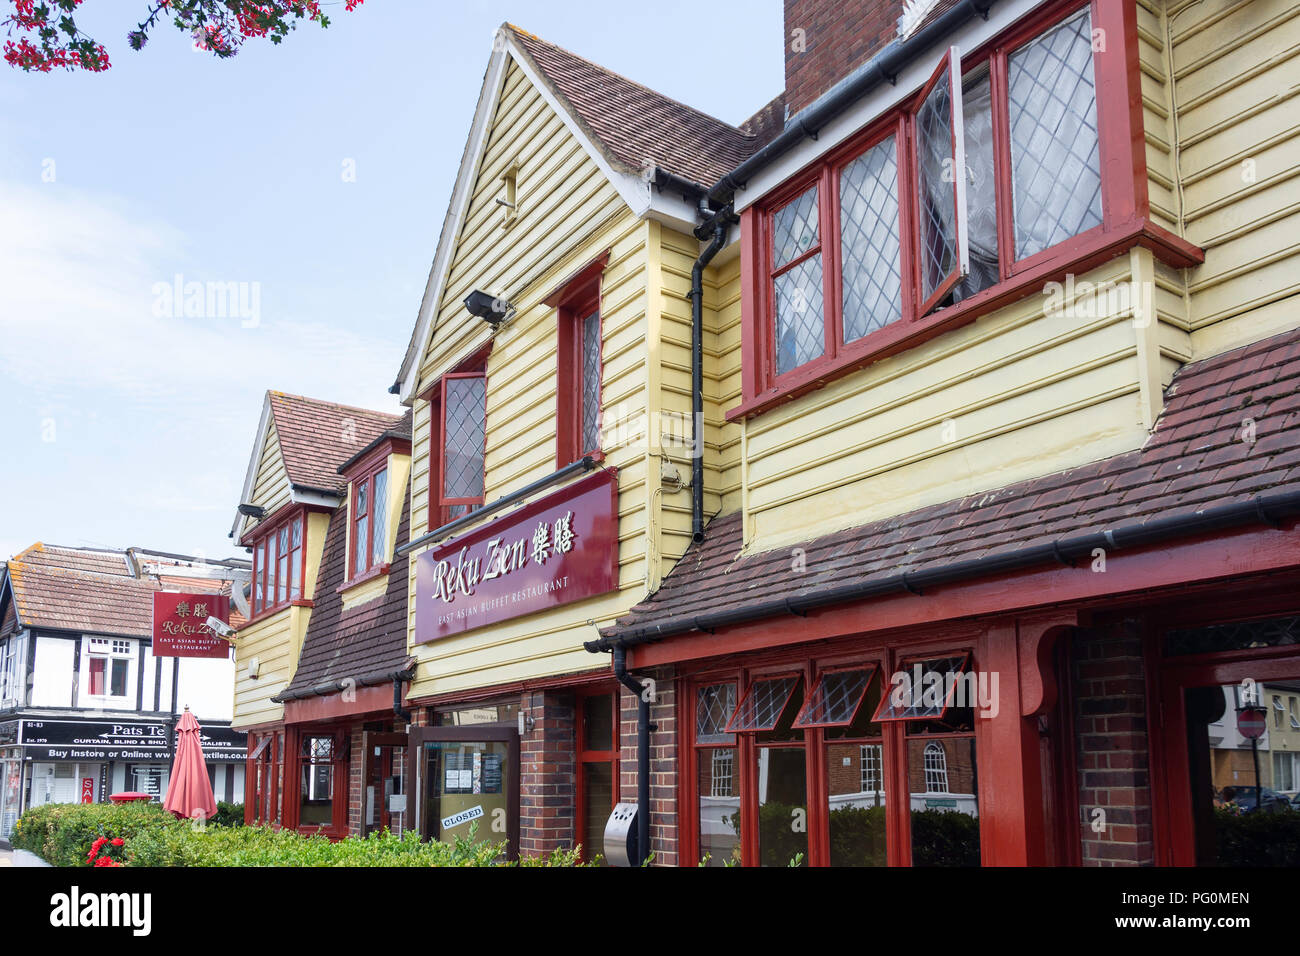 Asia Oriental Zen Reku, restaurante buffet, High Street, Orpington, London Borough of Bromley, Greater London, England, Reino Unido Imagen De Stock